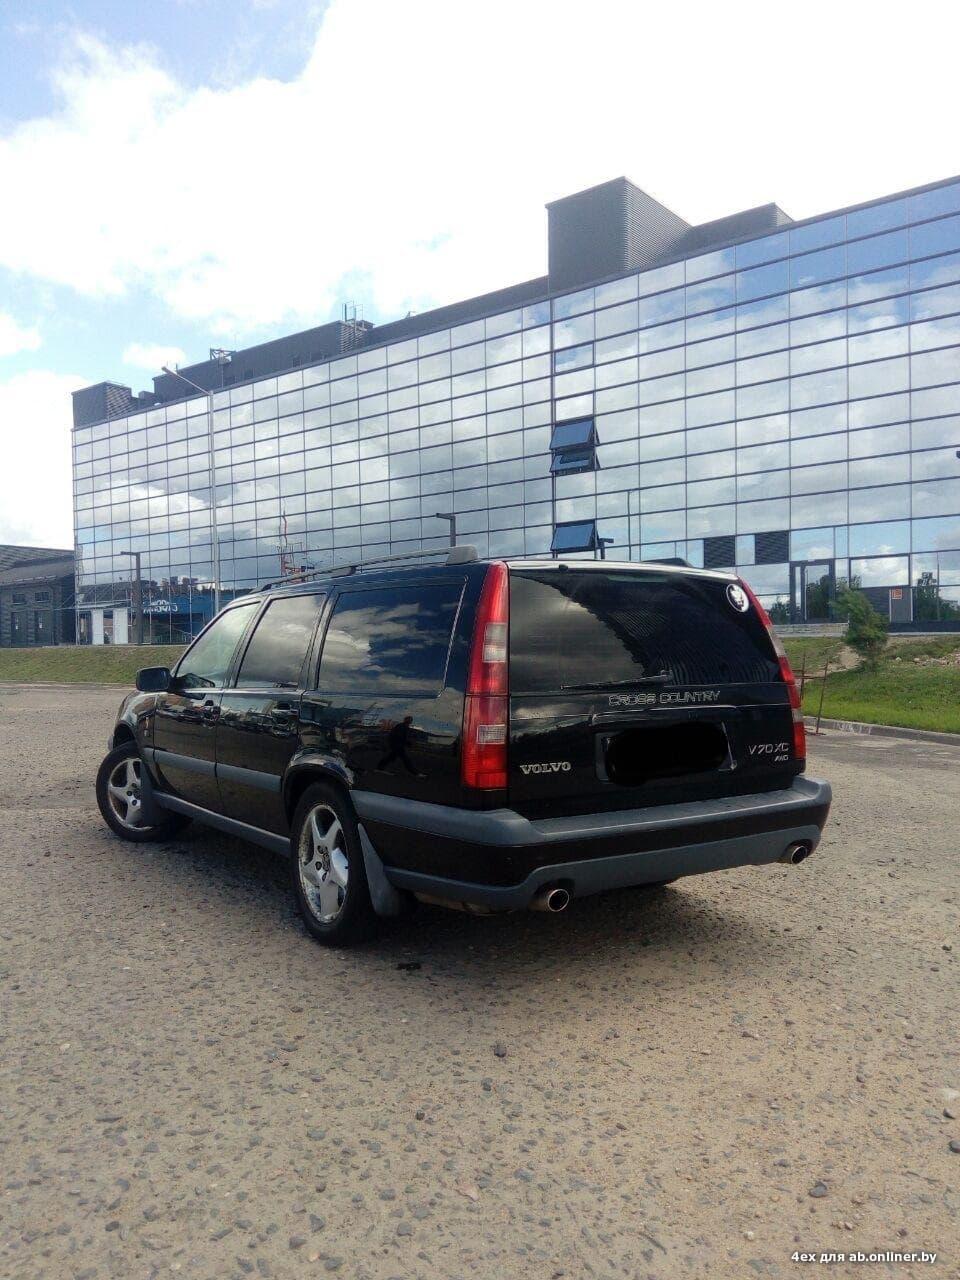 Volvo V70 cross country